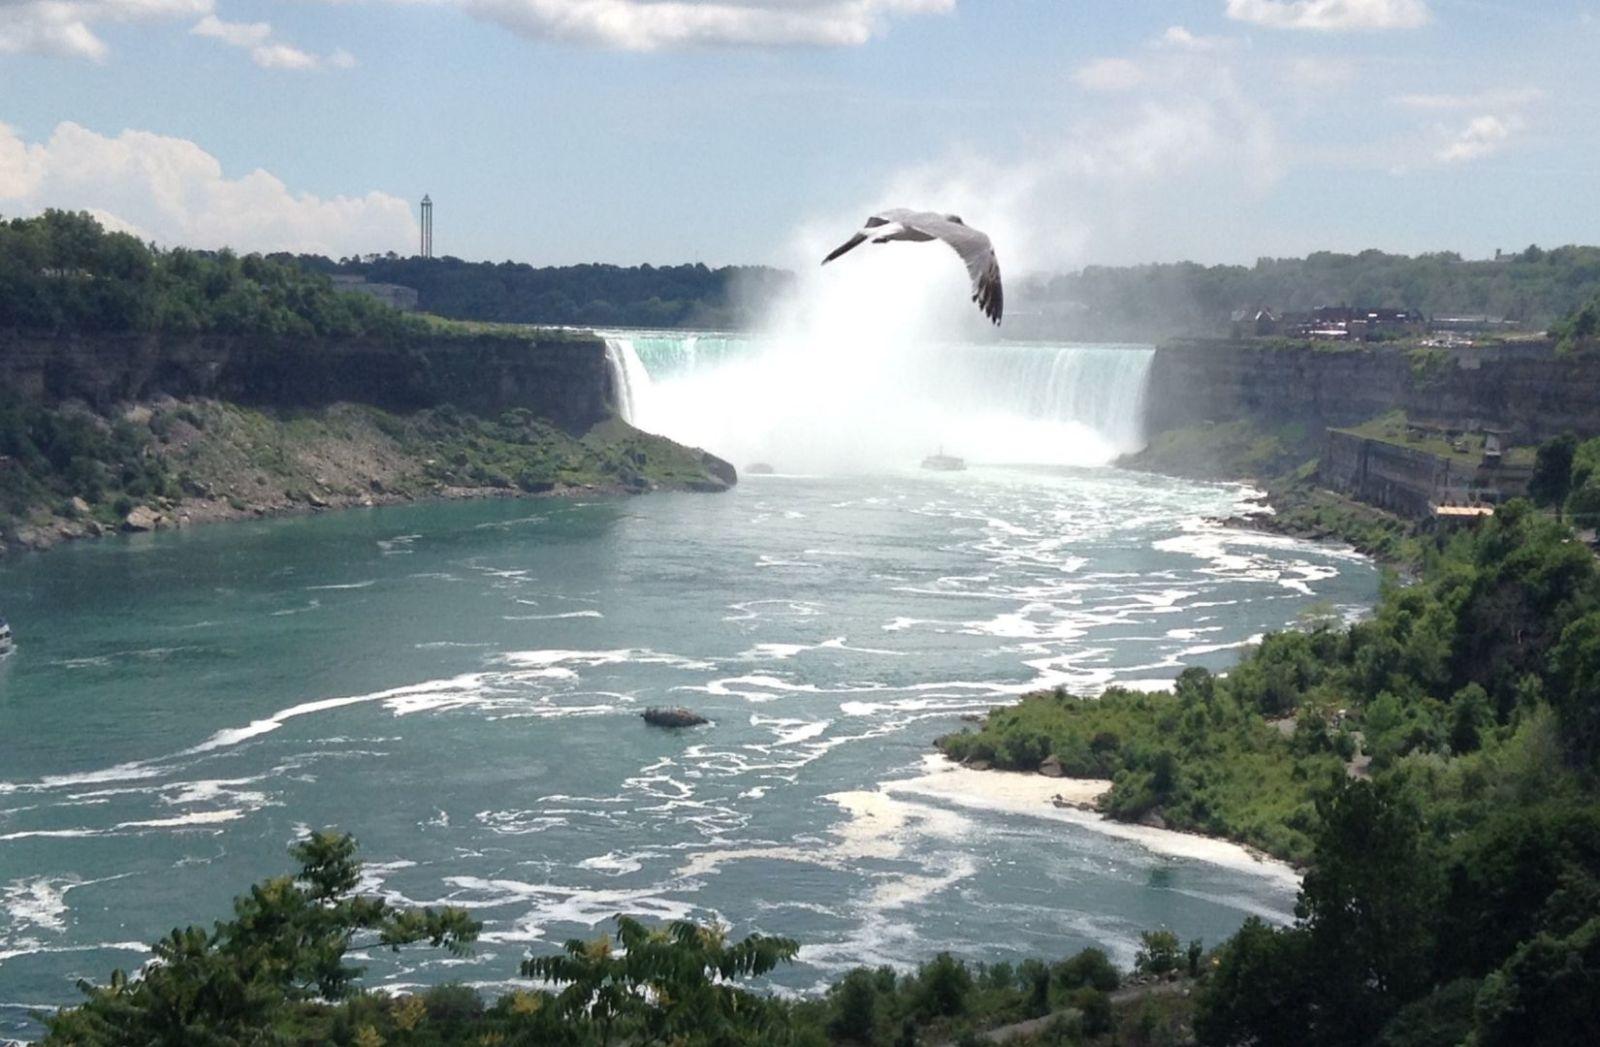 Niagarafälle in Kanada. (Foto: Chase B., Unsplash.com)